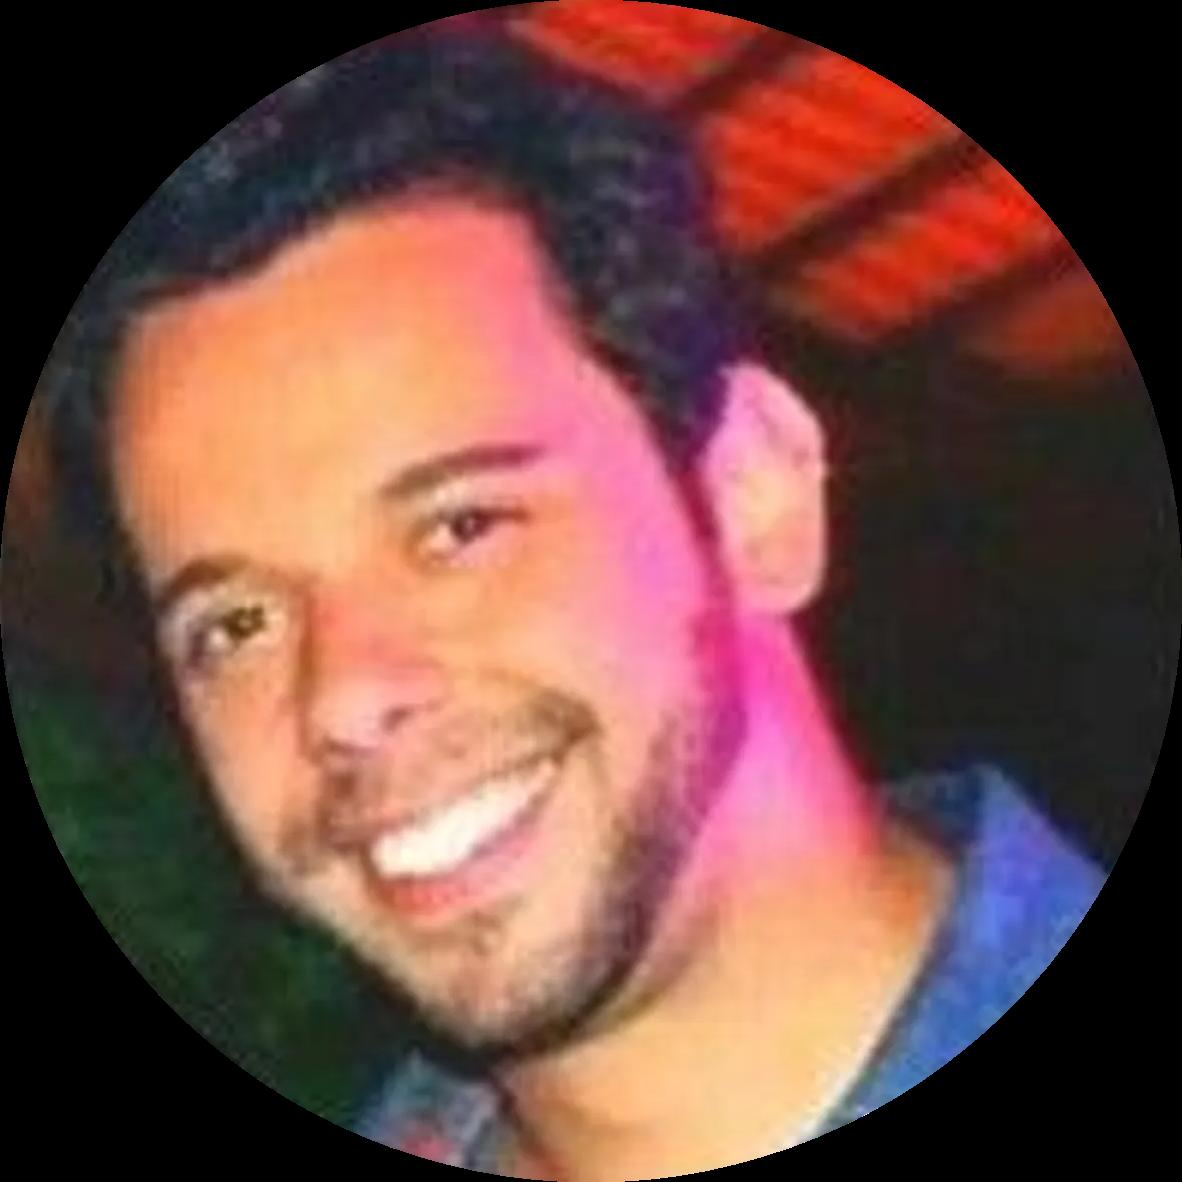 Luiz Chiqueto 巴西网页经理